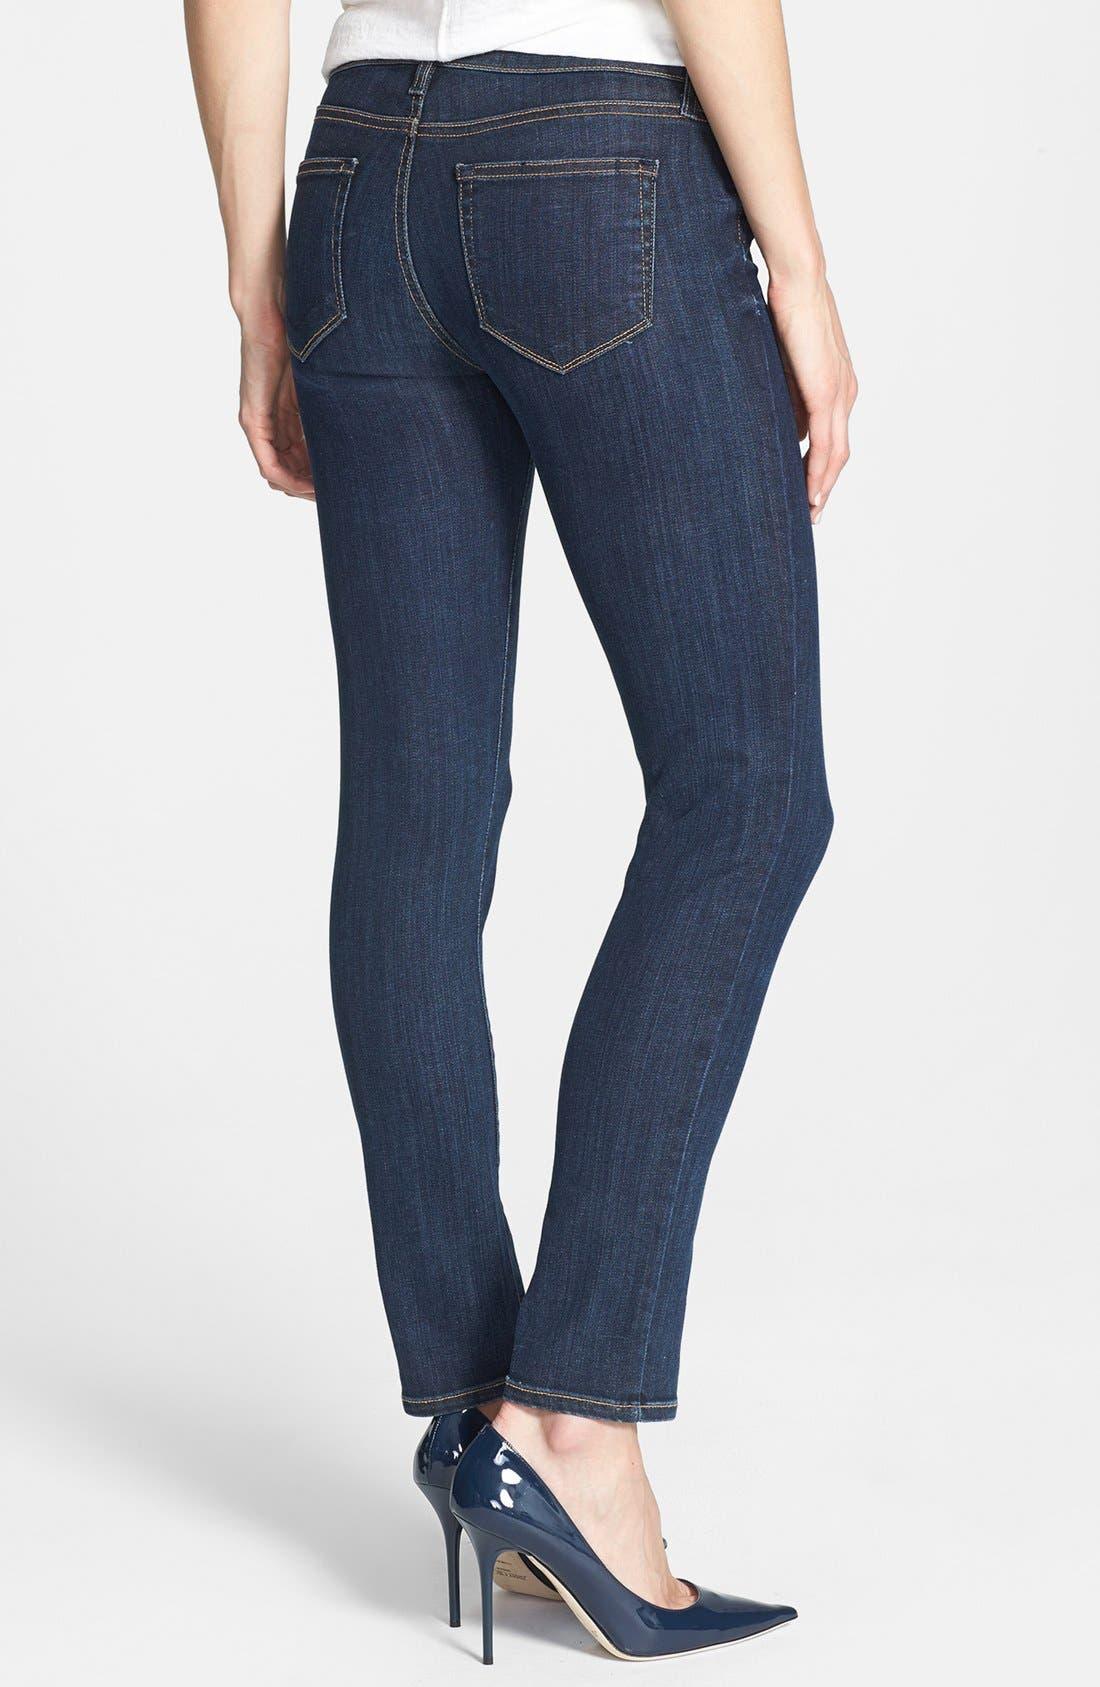 Alternate Image 2  - Paige Denim 'Skyline' Skinny Ankle Jeans (Delancy)